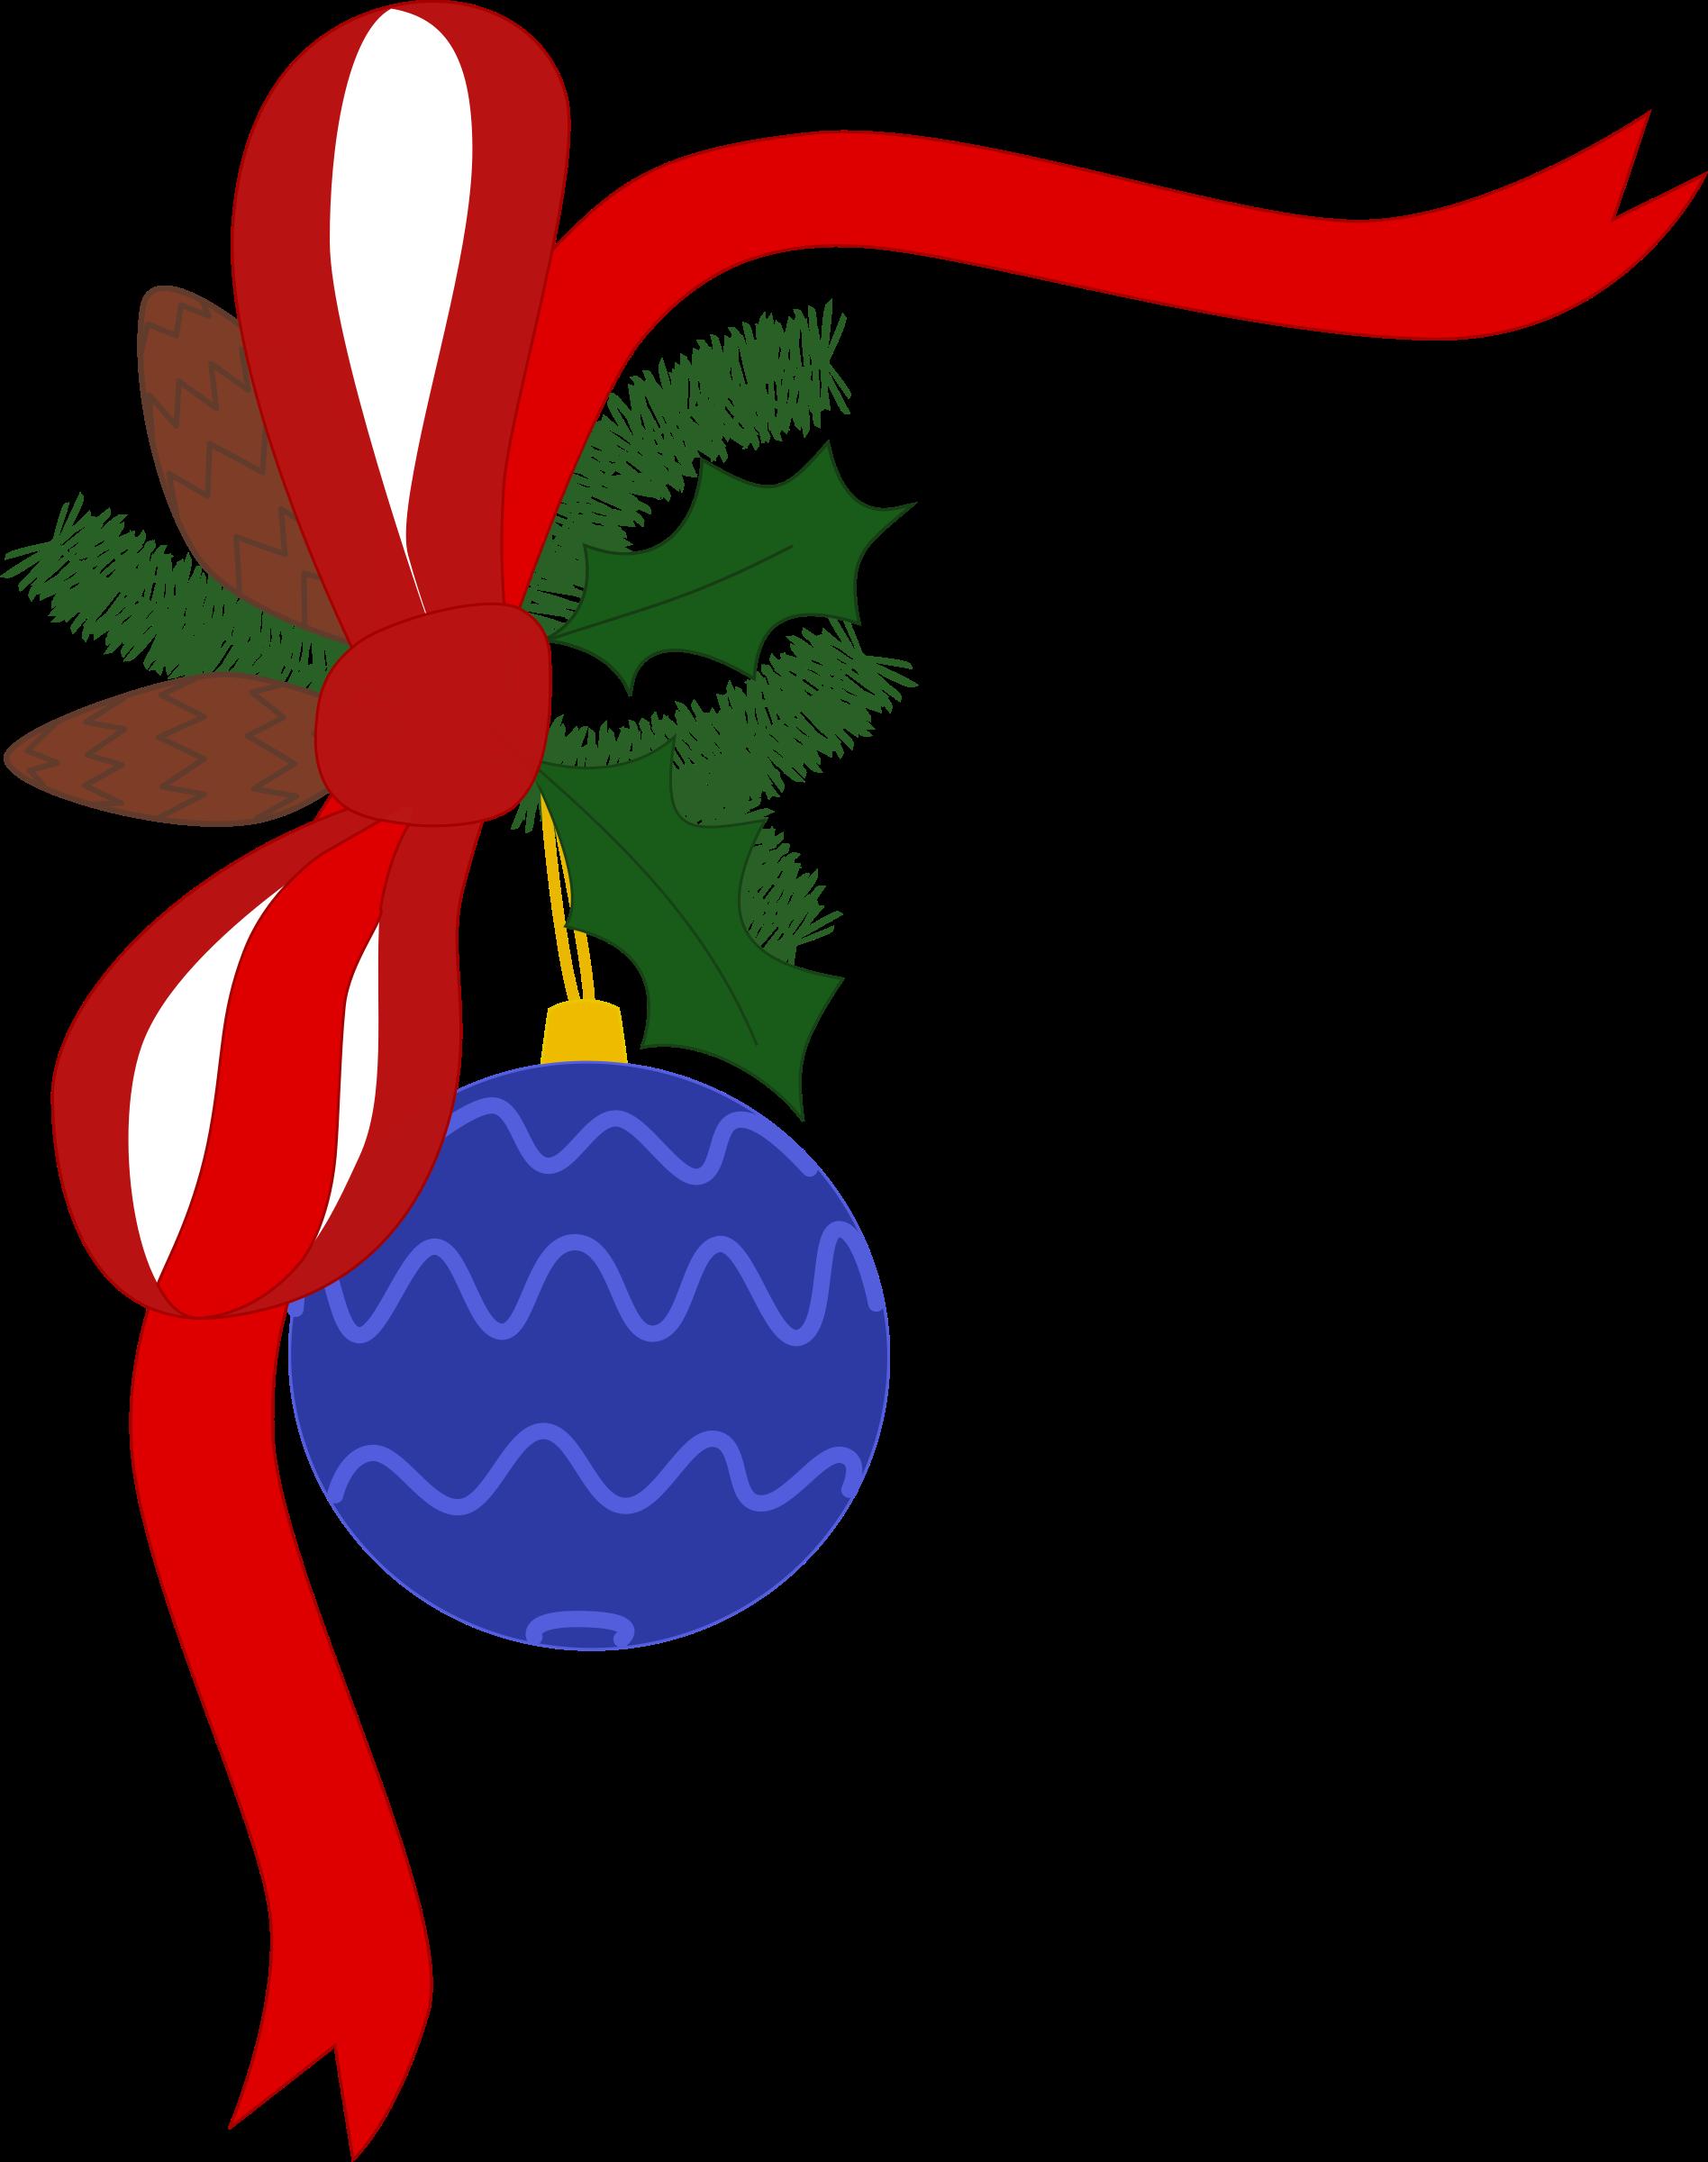 Christmas Break Clipart.Clipart Christmas Break Clipart Christmas Break Transparent